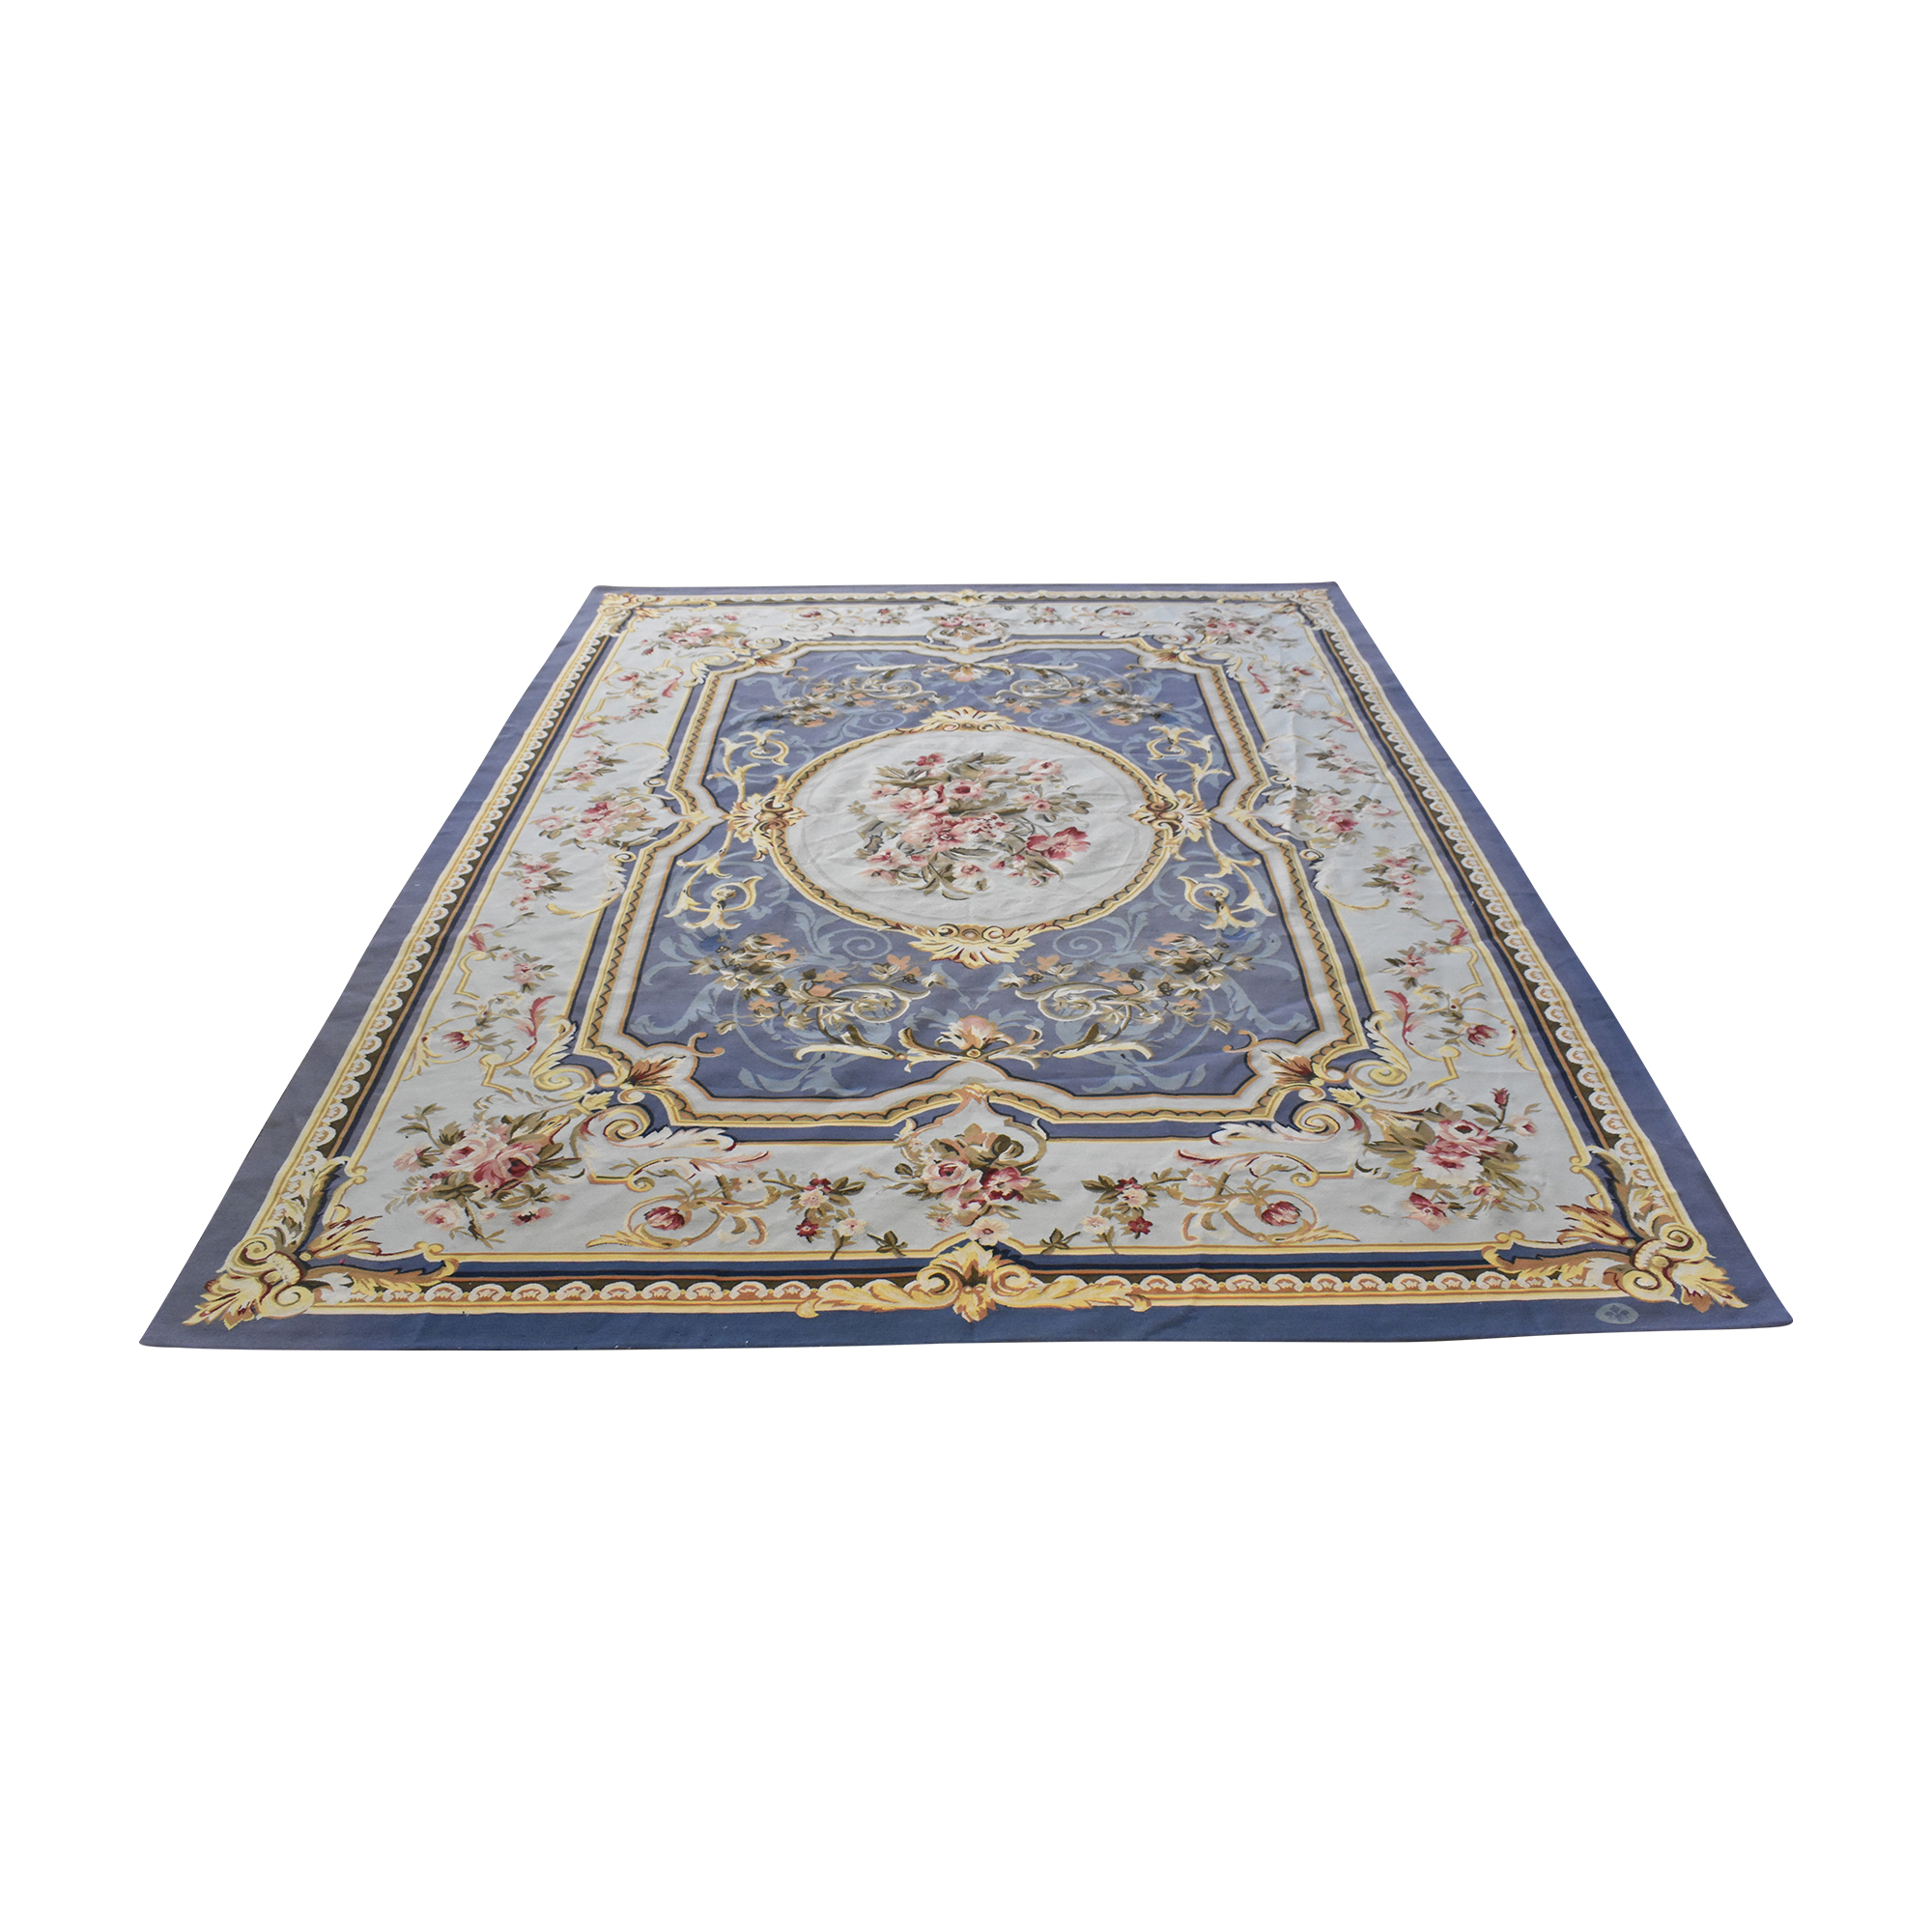 ABC Carpet & Home ABC Carpet & Home Aubusson-Style Area Rug for sale